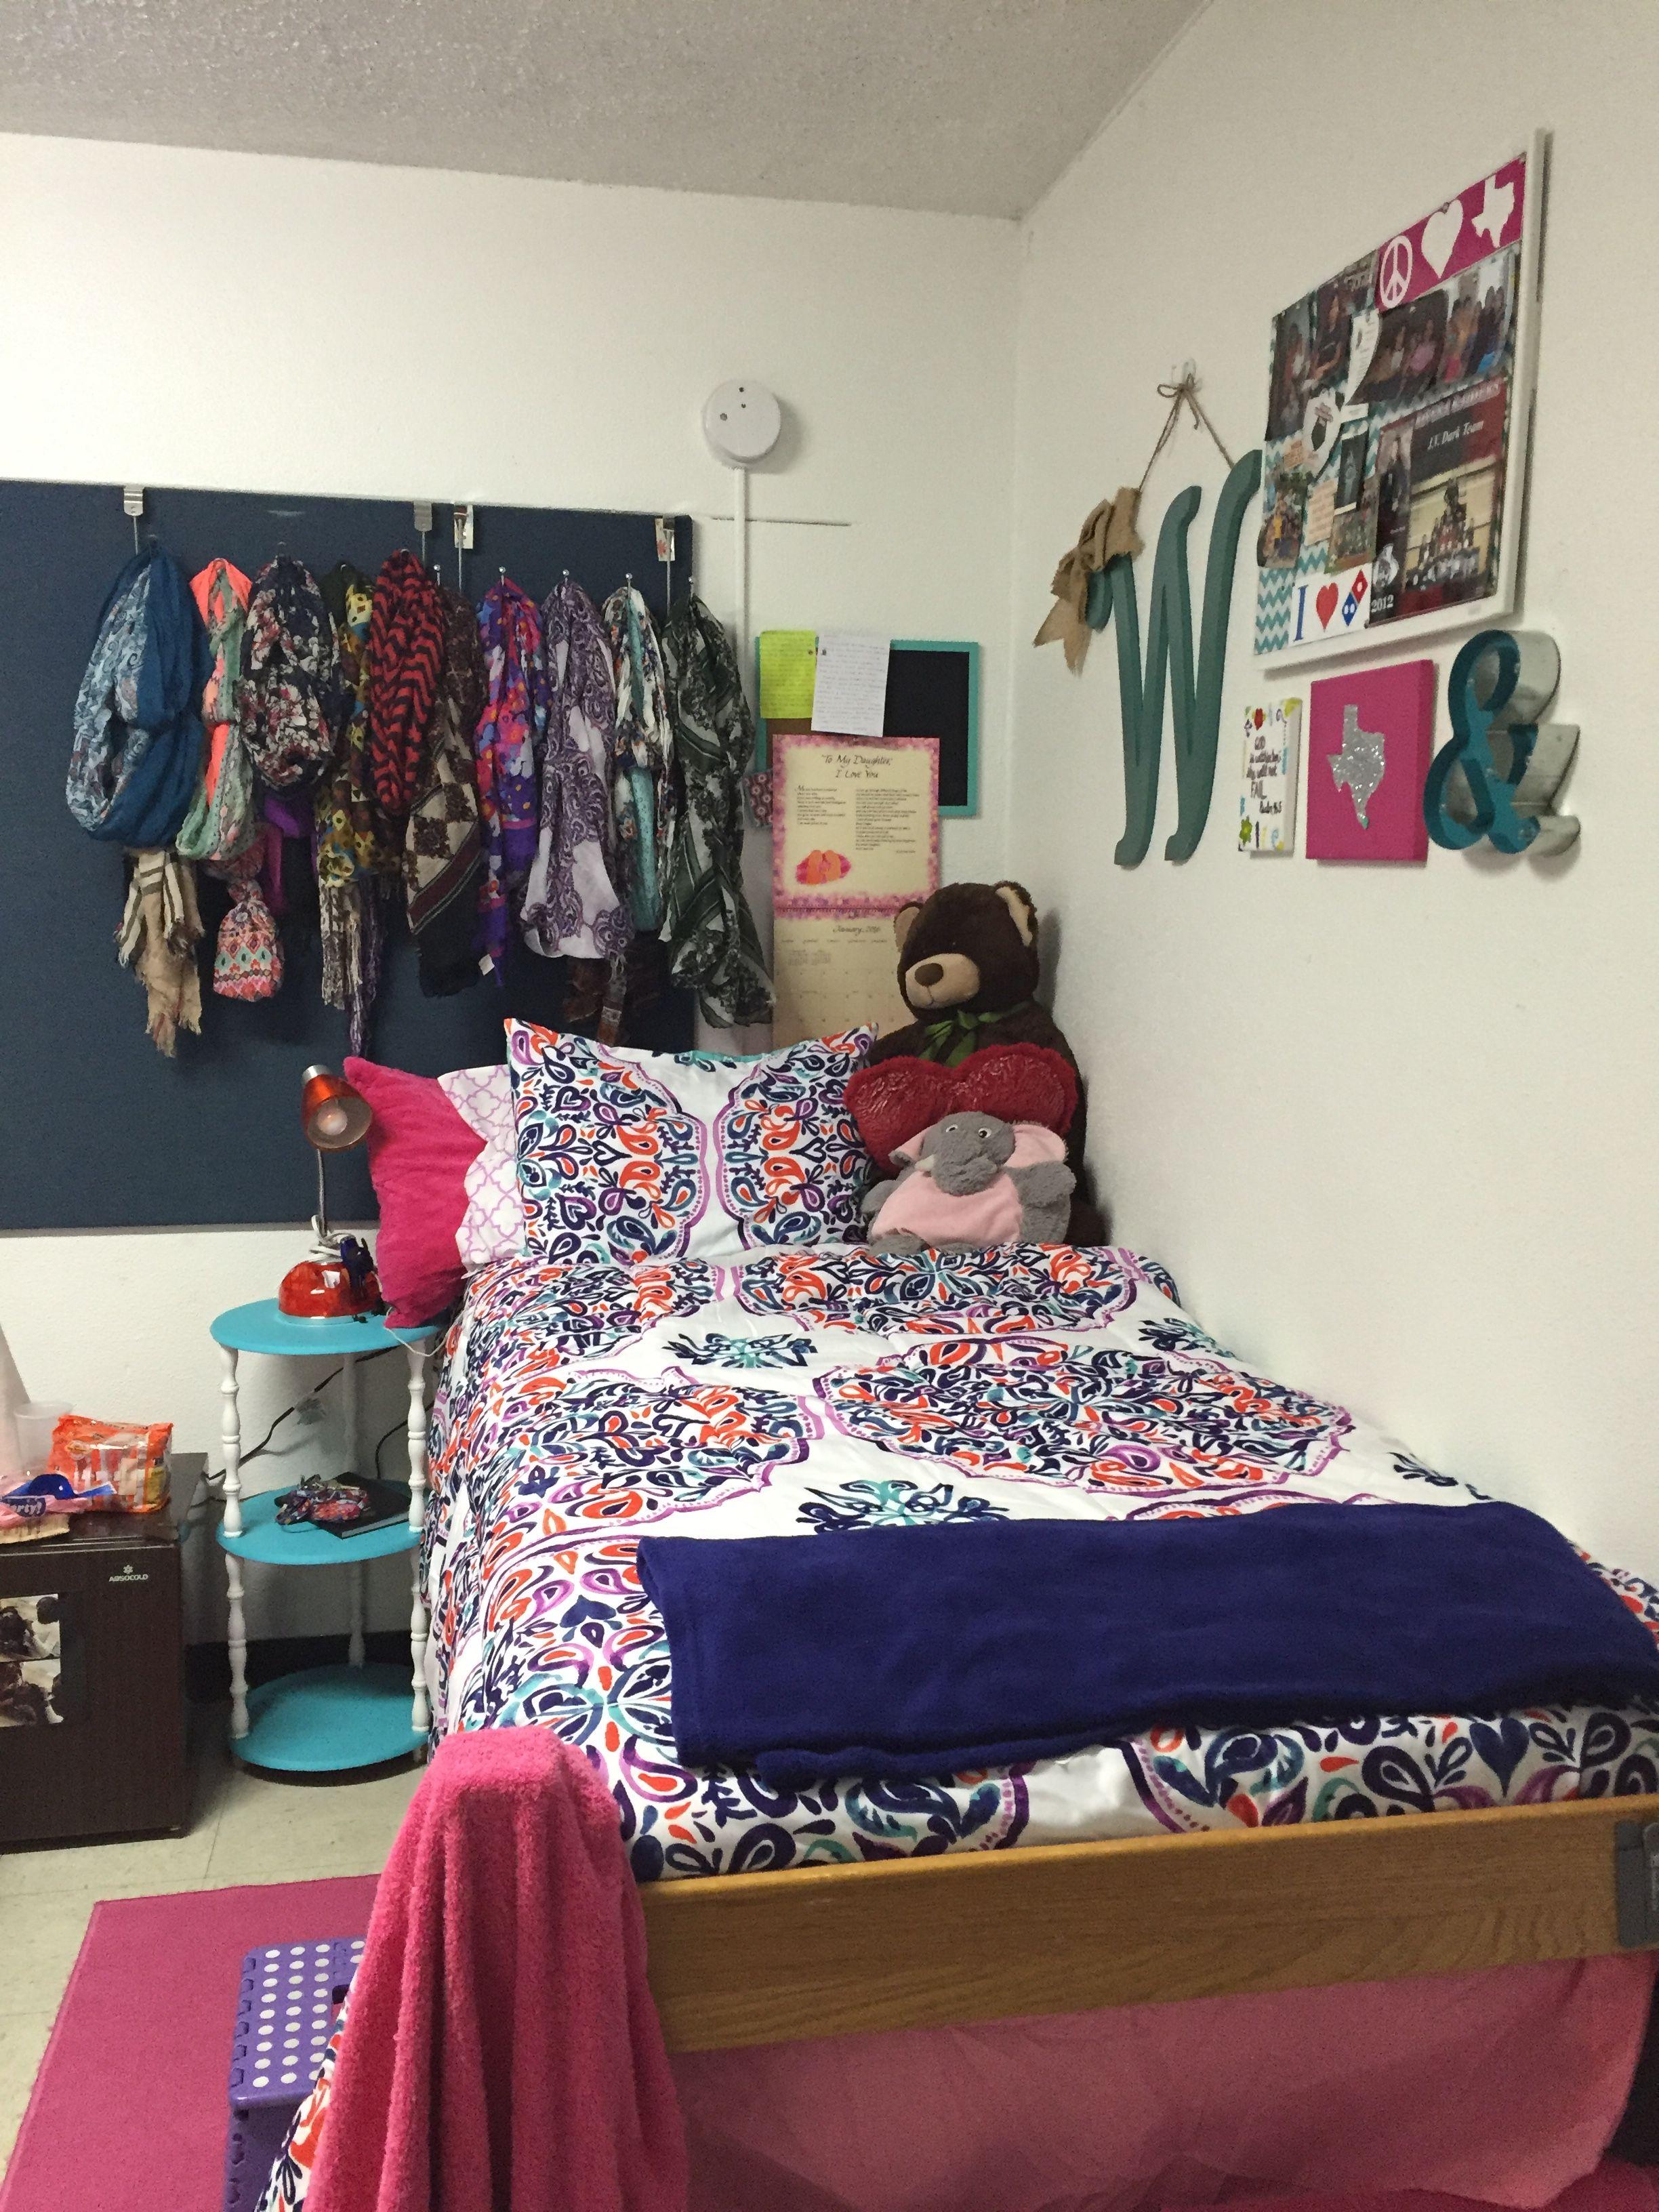 Sam Houston State University Dorm Room Small House Texas